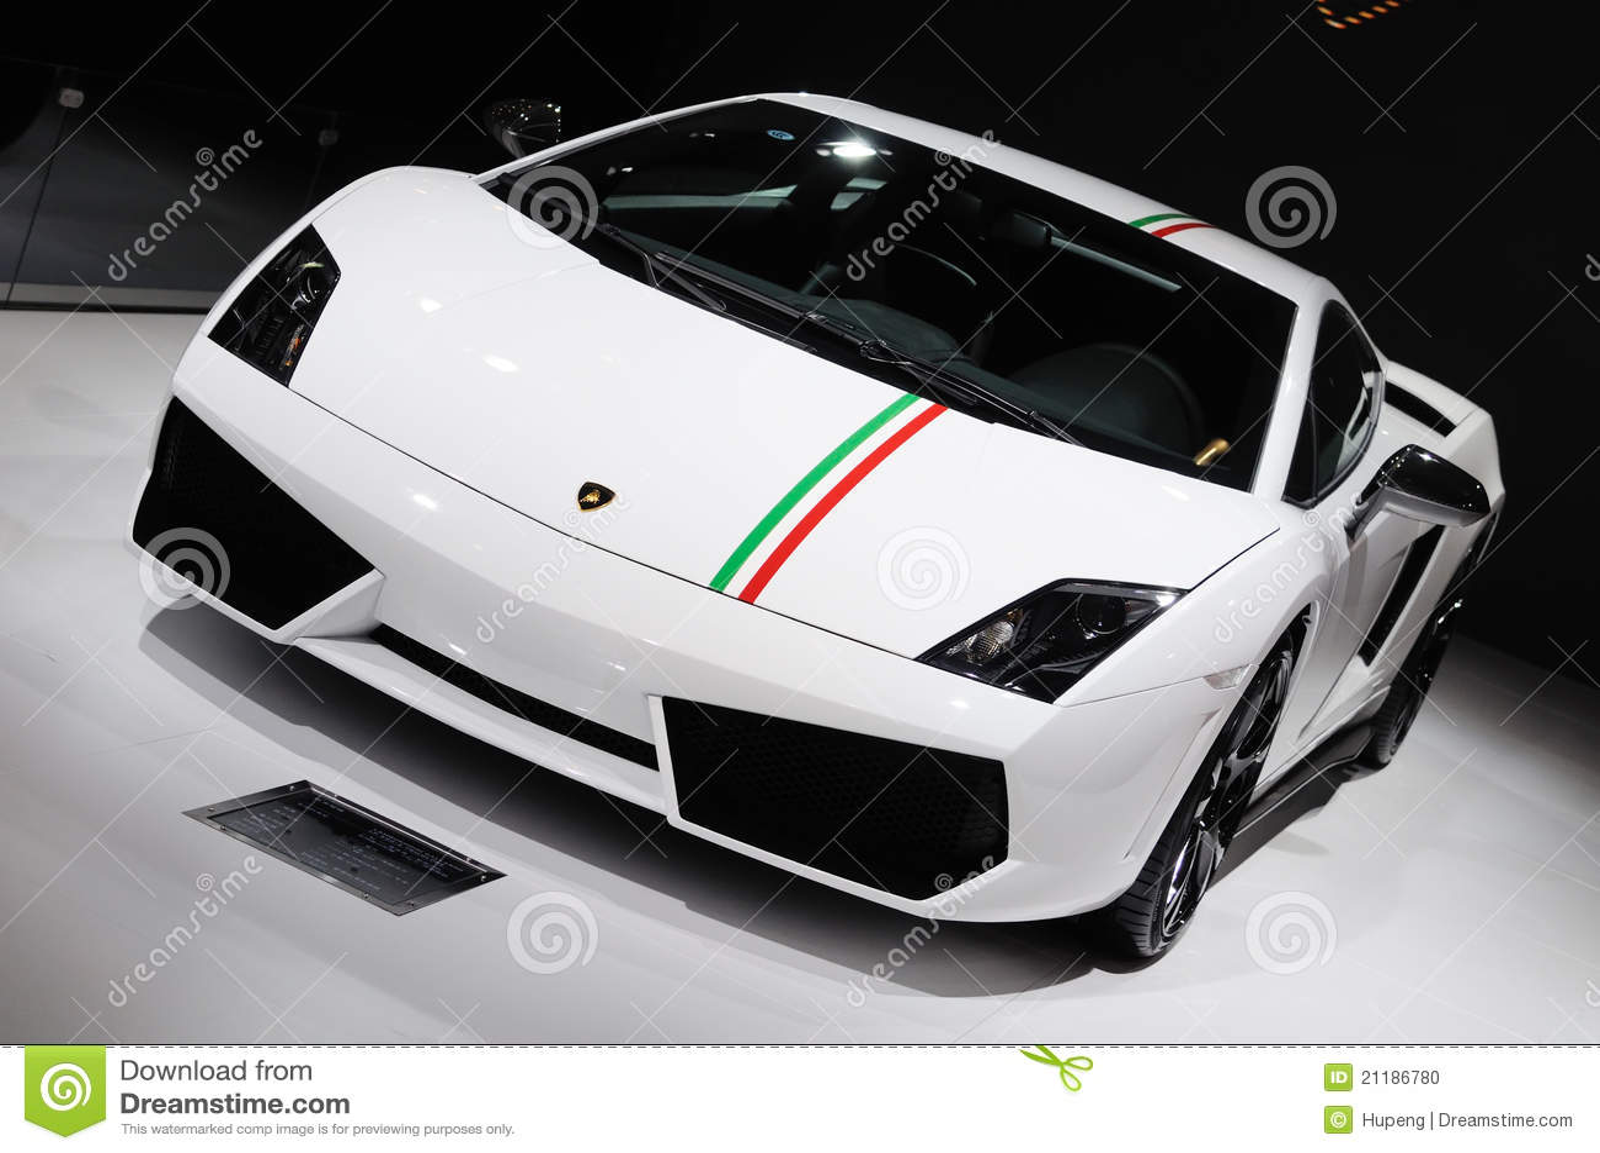 Italy Lamborghini Gallardo Lp 550 2 Tricolore Editorial Image